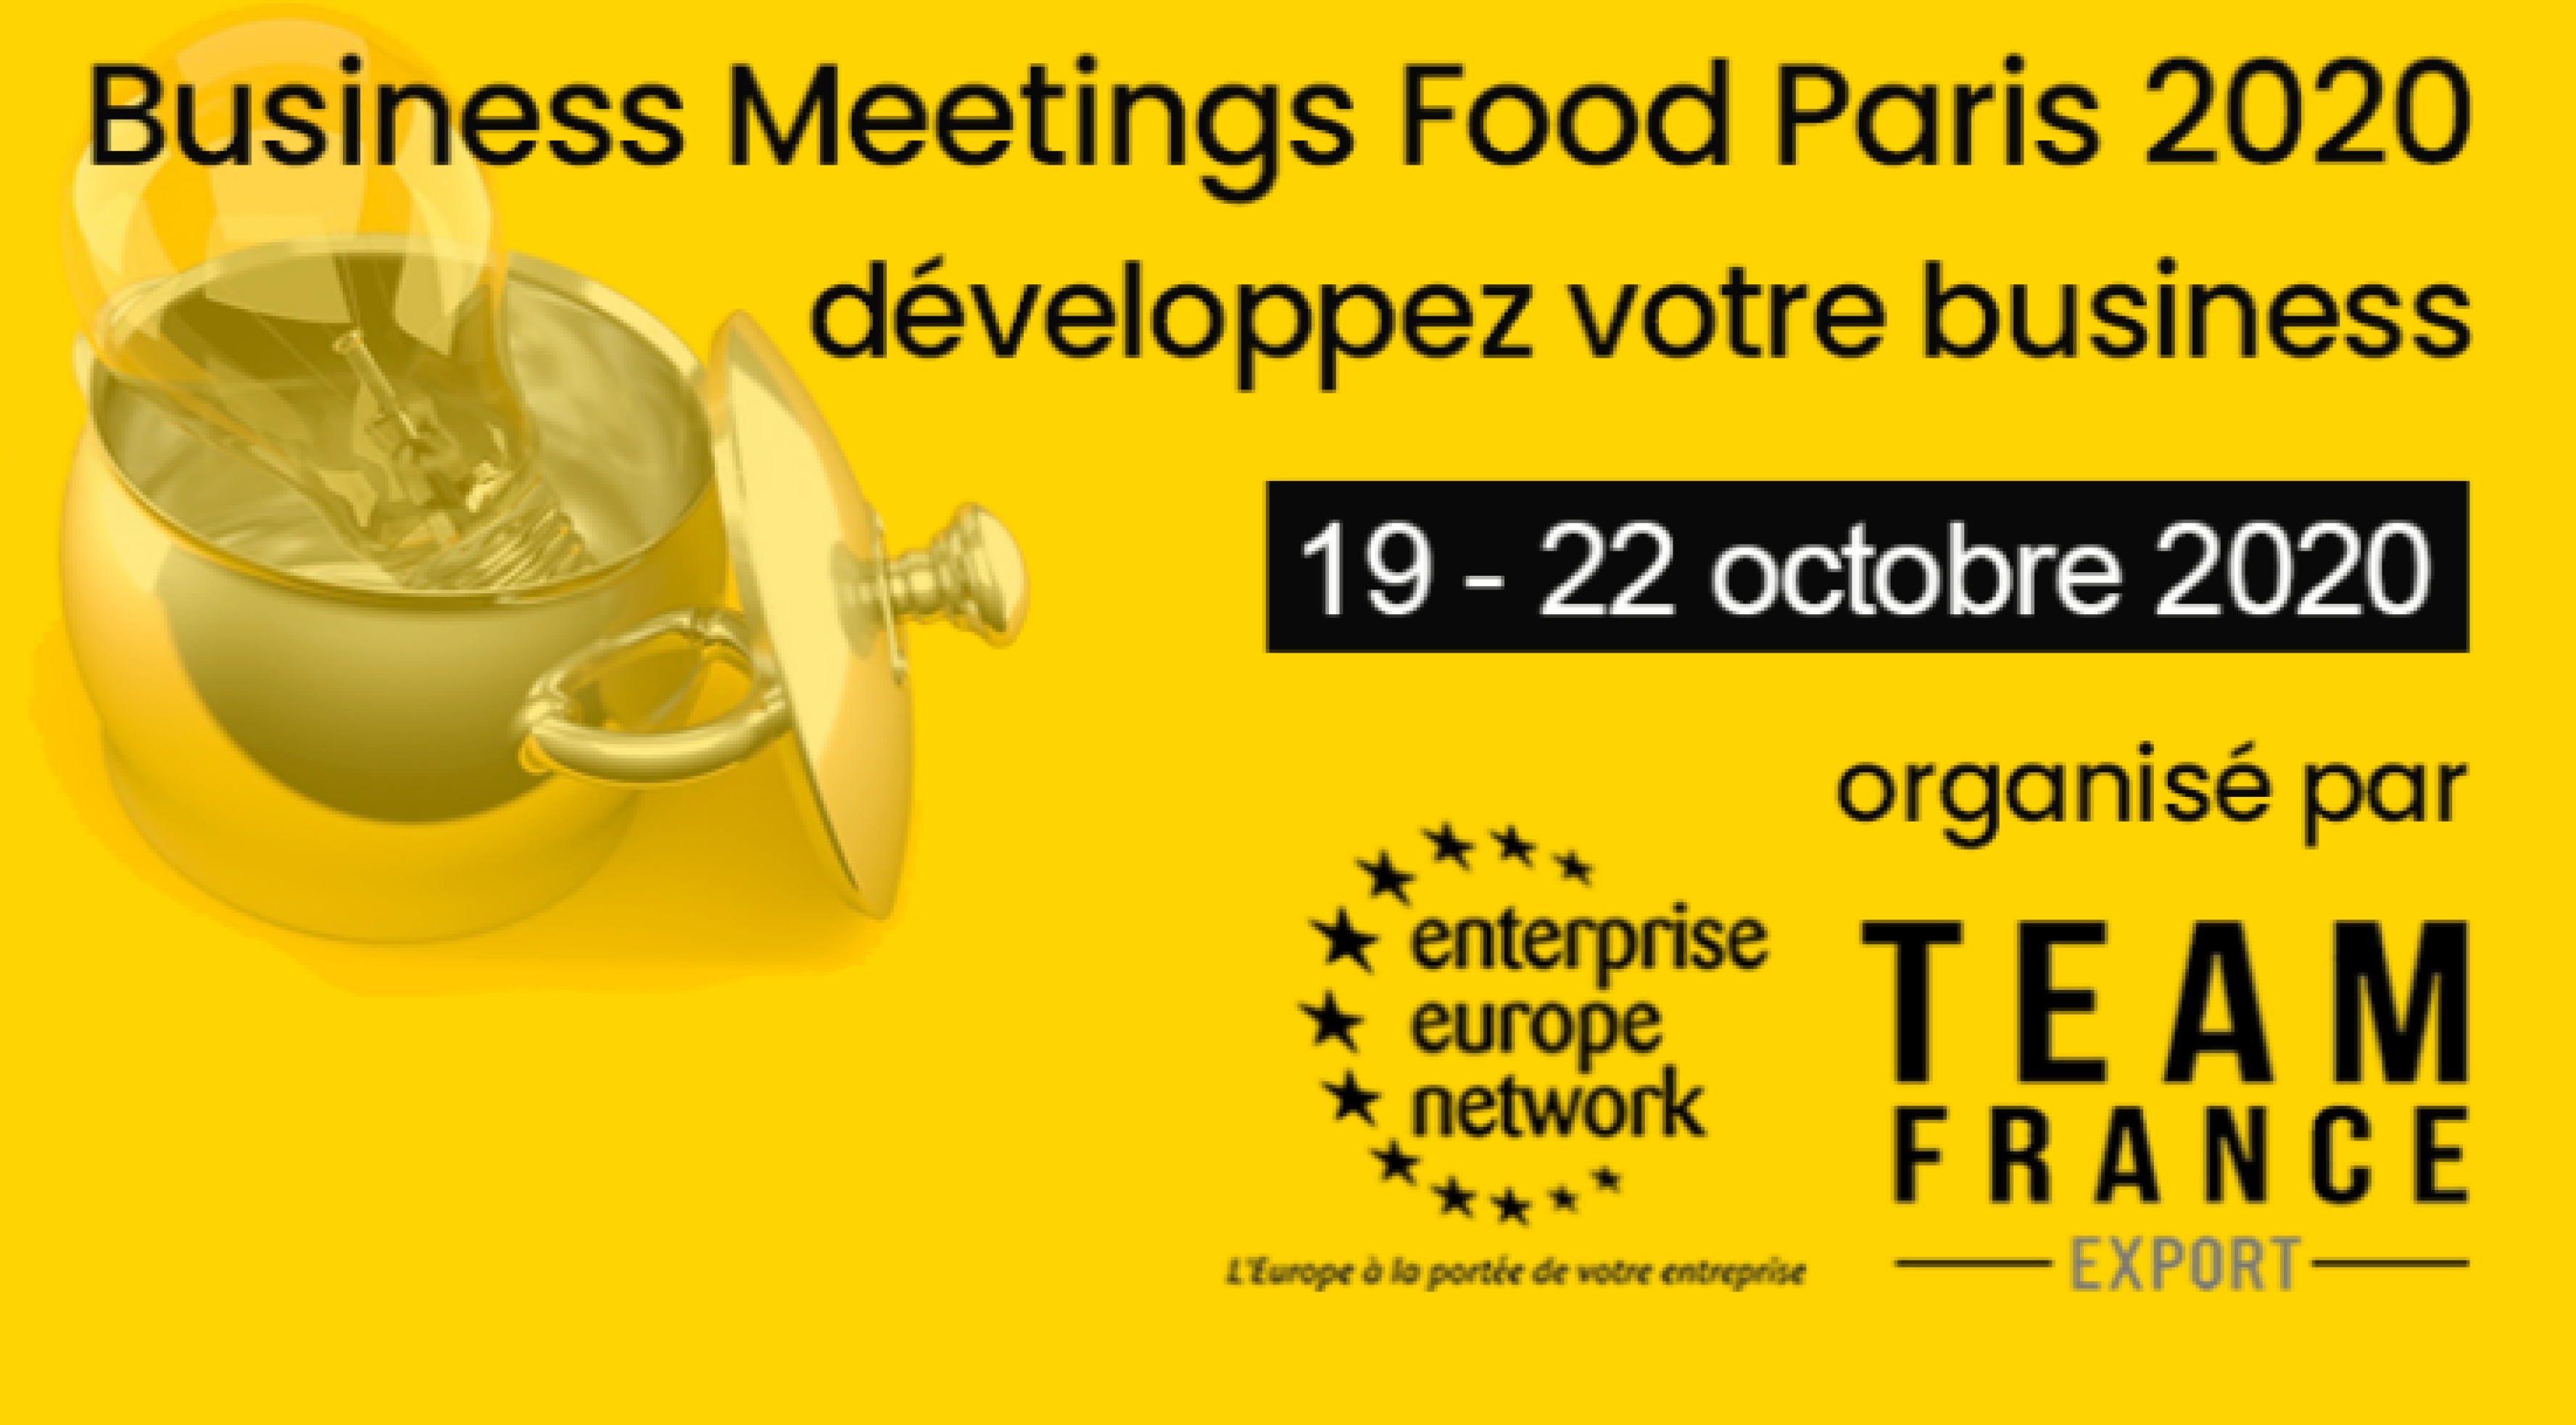 Business Meeting Food Paris 2020